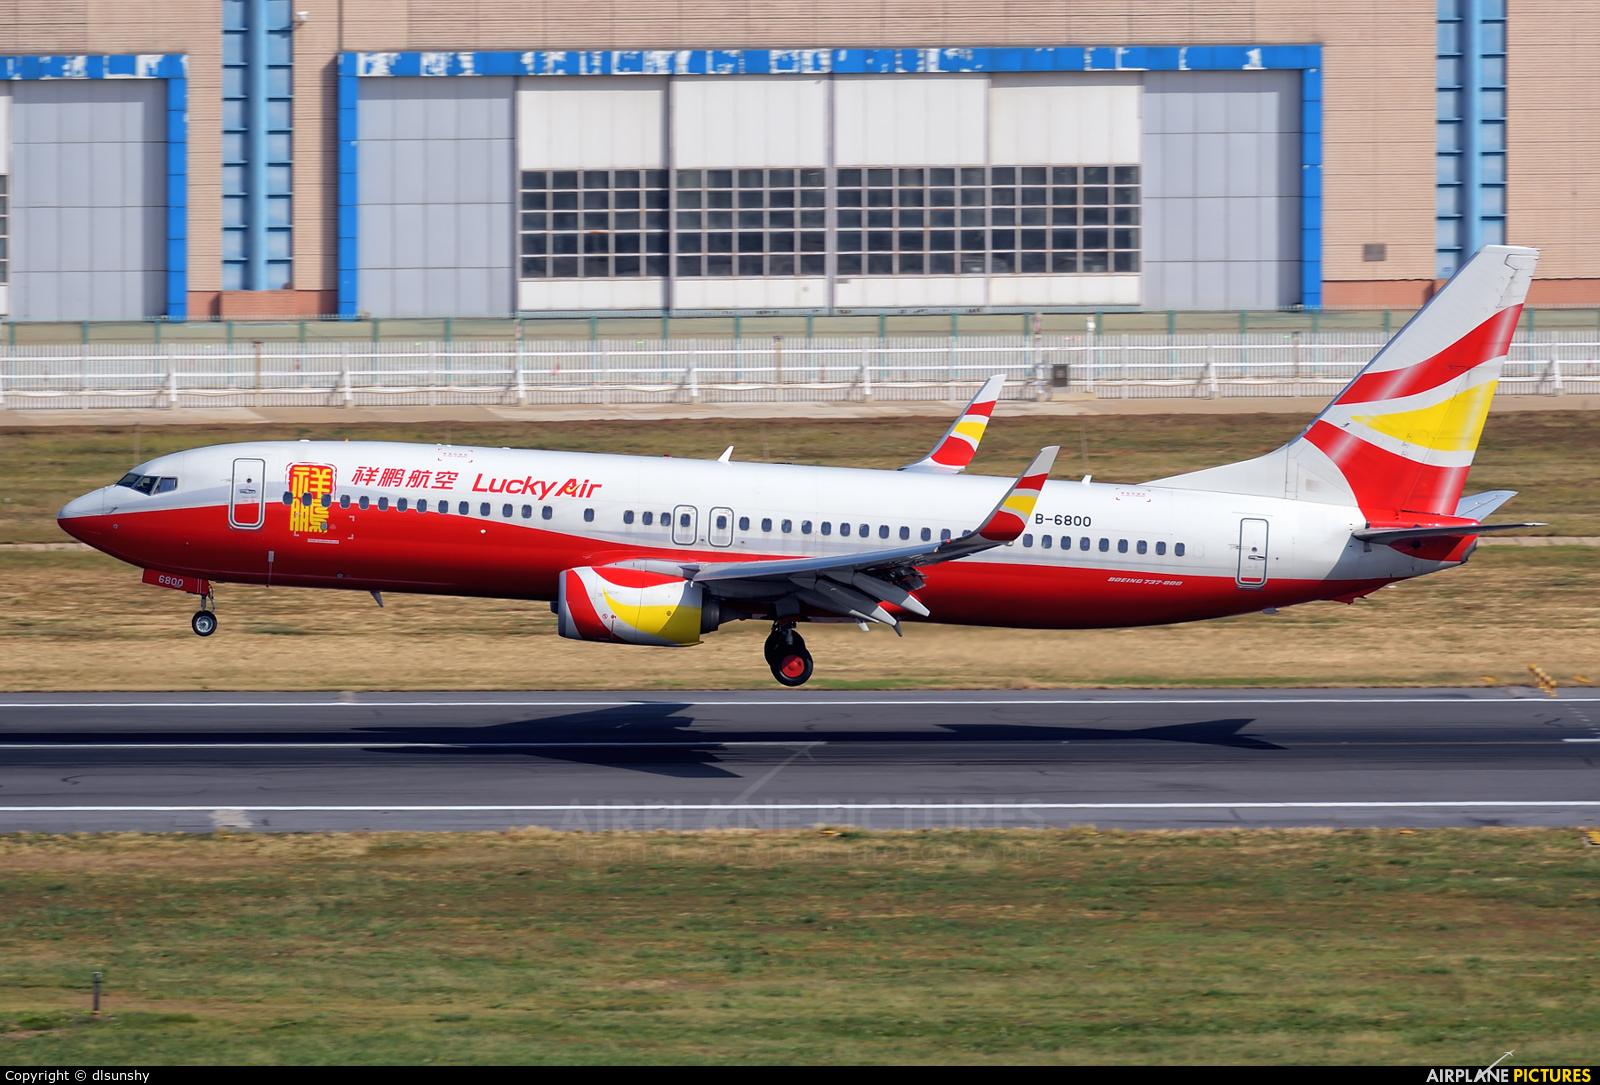 Lucky Air B-6800 aircraft at Dalian Zhoushuizi Int'l